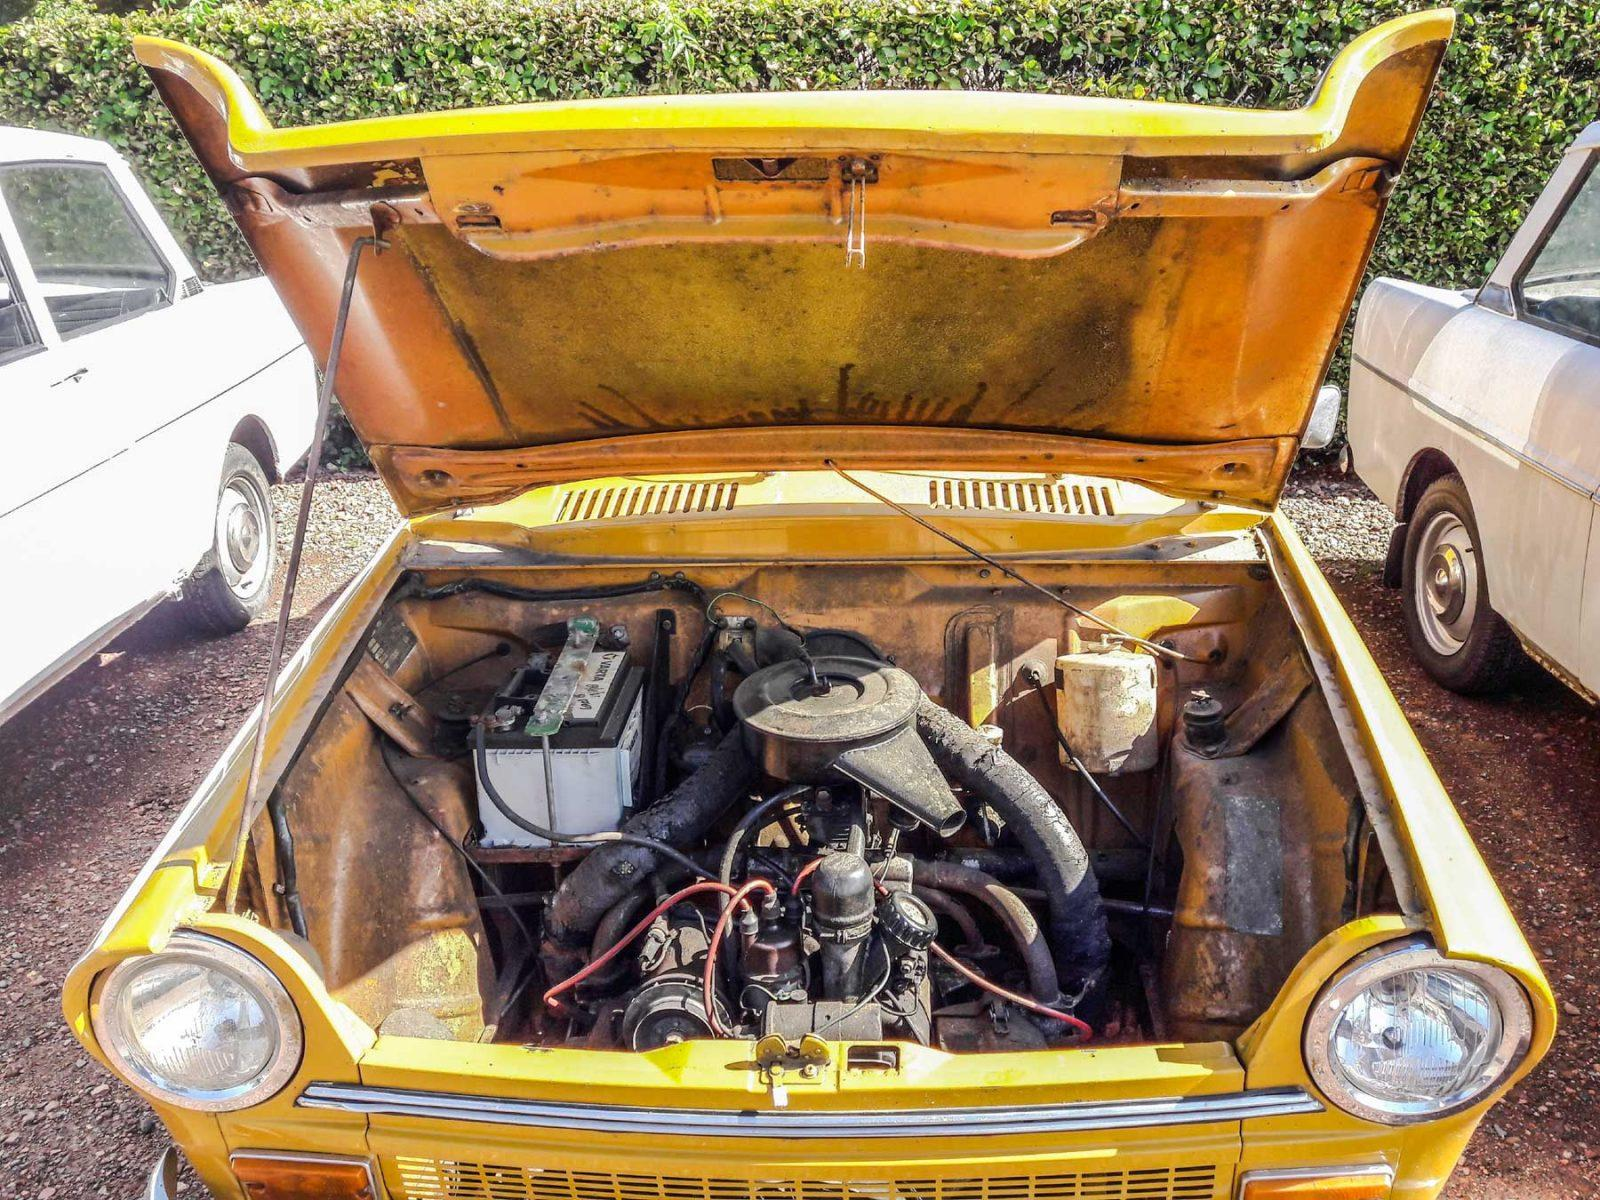 DAF 33 motor